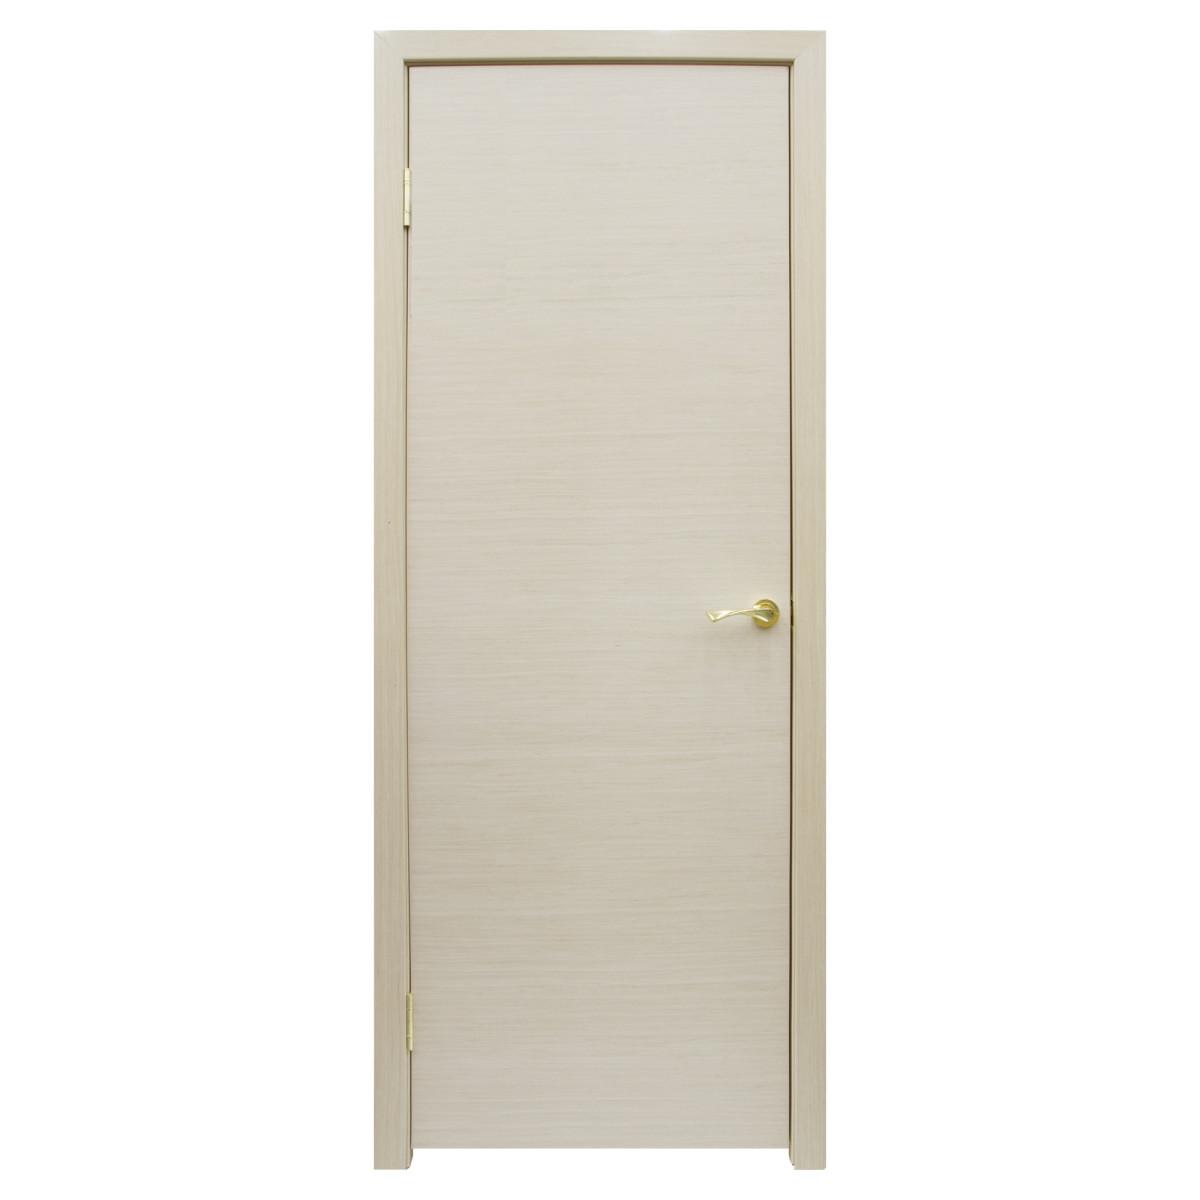 Дверь Межкомнатная Глухая Шарлотт 70x200 Шпон Цвет Дуб Белёный